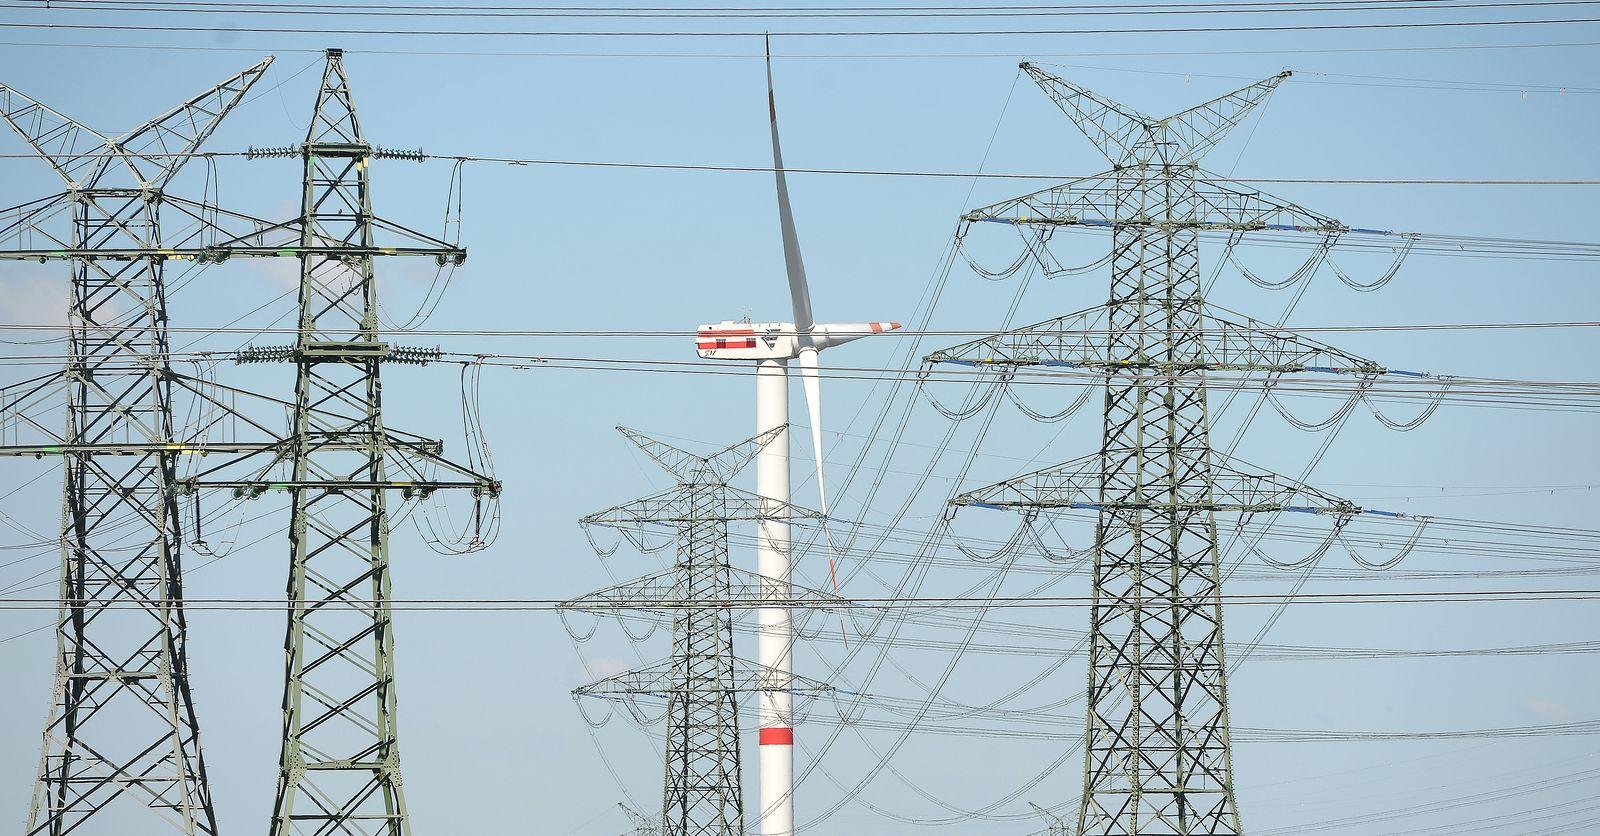 Windenergie / Strom / Erneuerbare Energie / Windrad